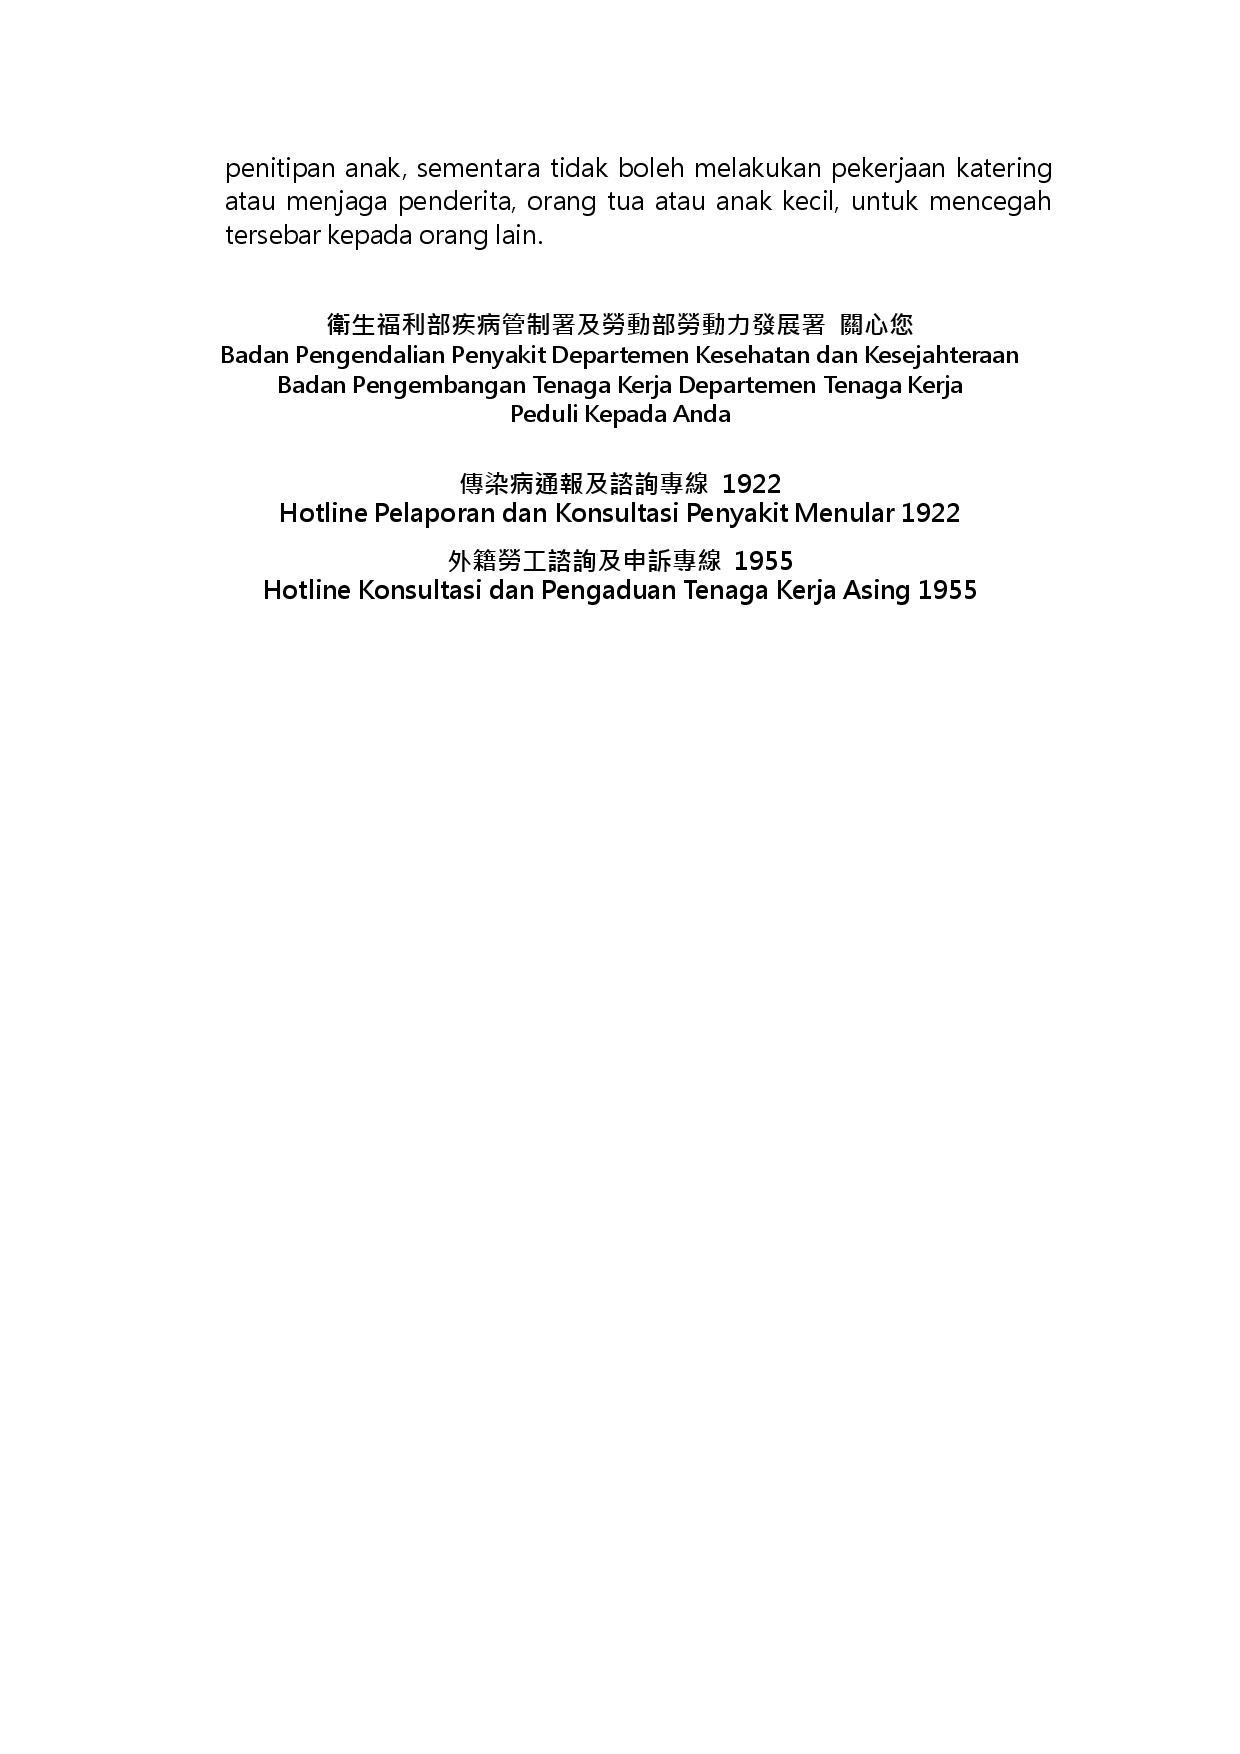 詳如附件【Klik】Mencegah Gastroenteritis Bakteri(Halaman 3)預防細菌性腸胃炎(印尼文)